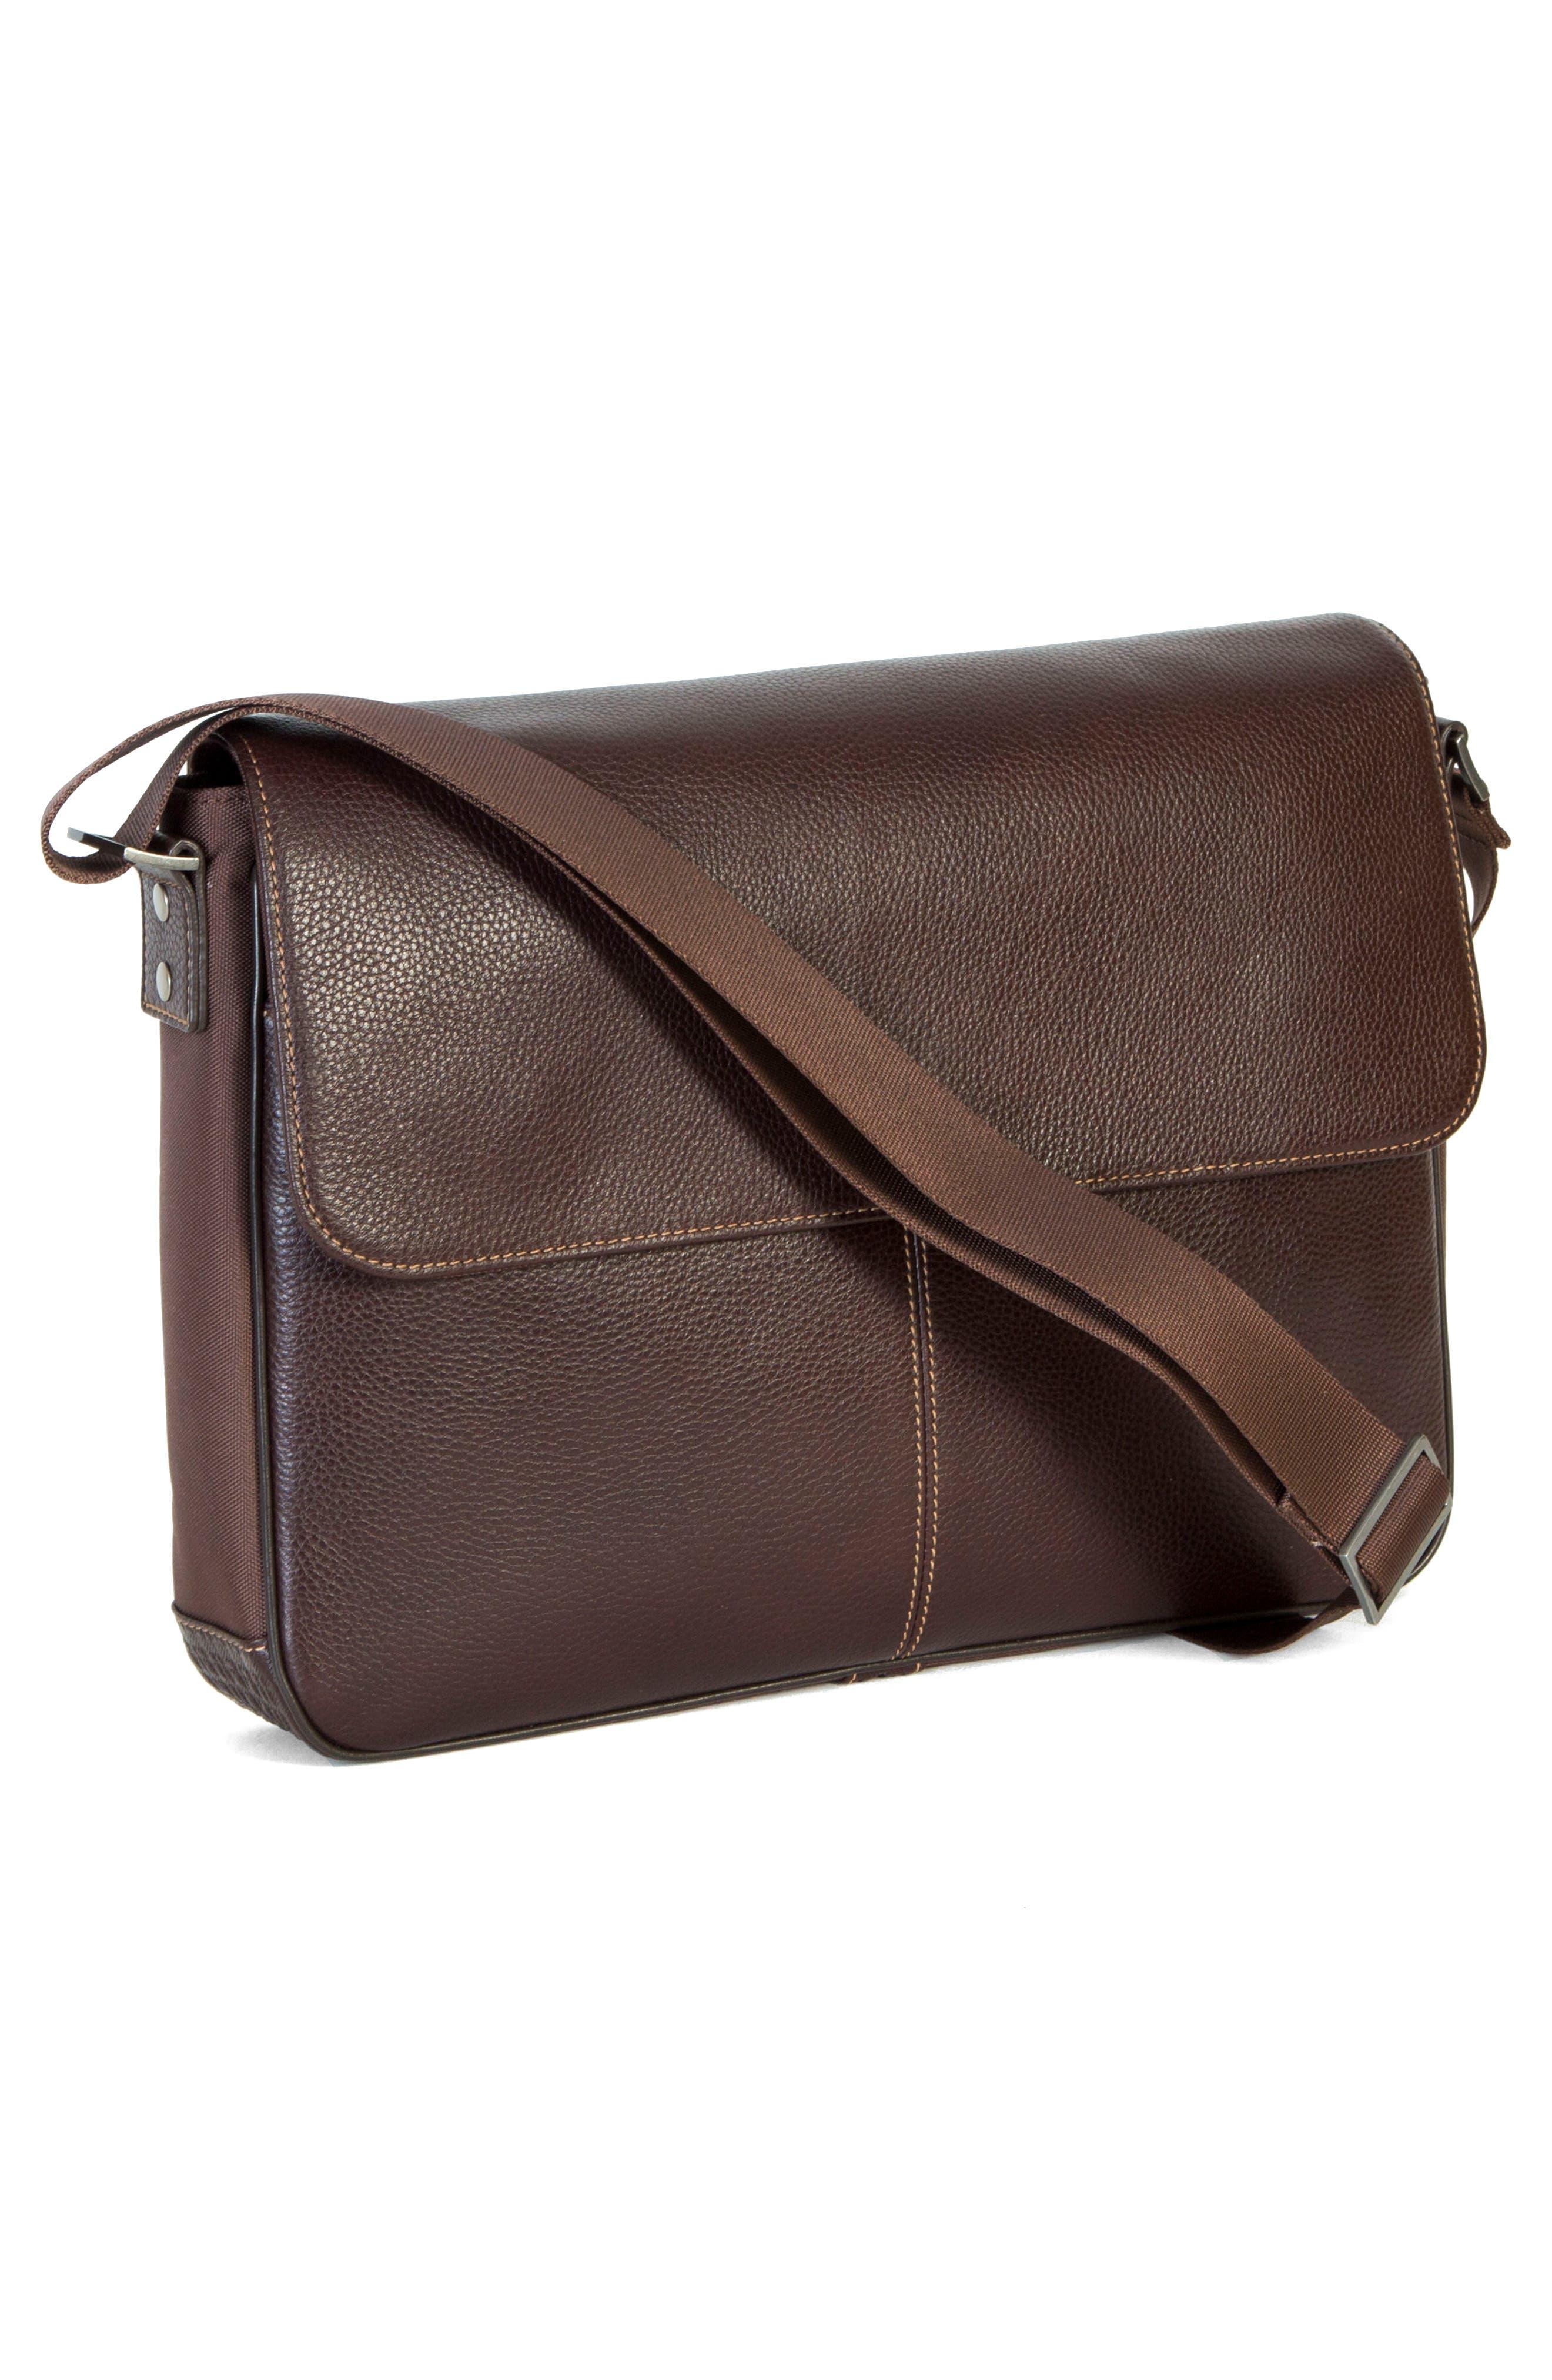 Tyler Leather Messenger Bag,                             Alternate thumbnail 3, color,                             Coffee